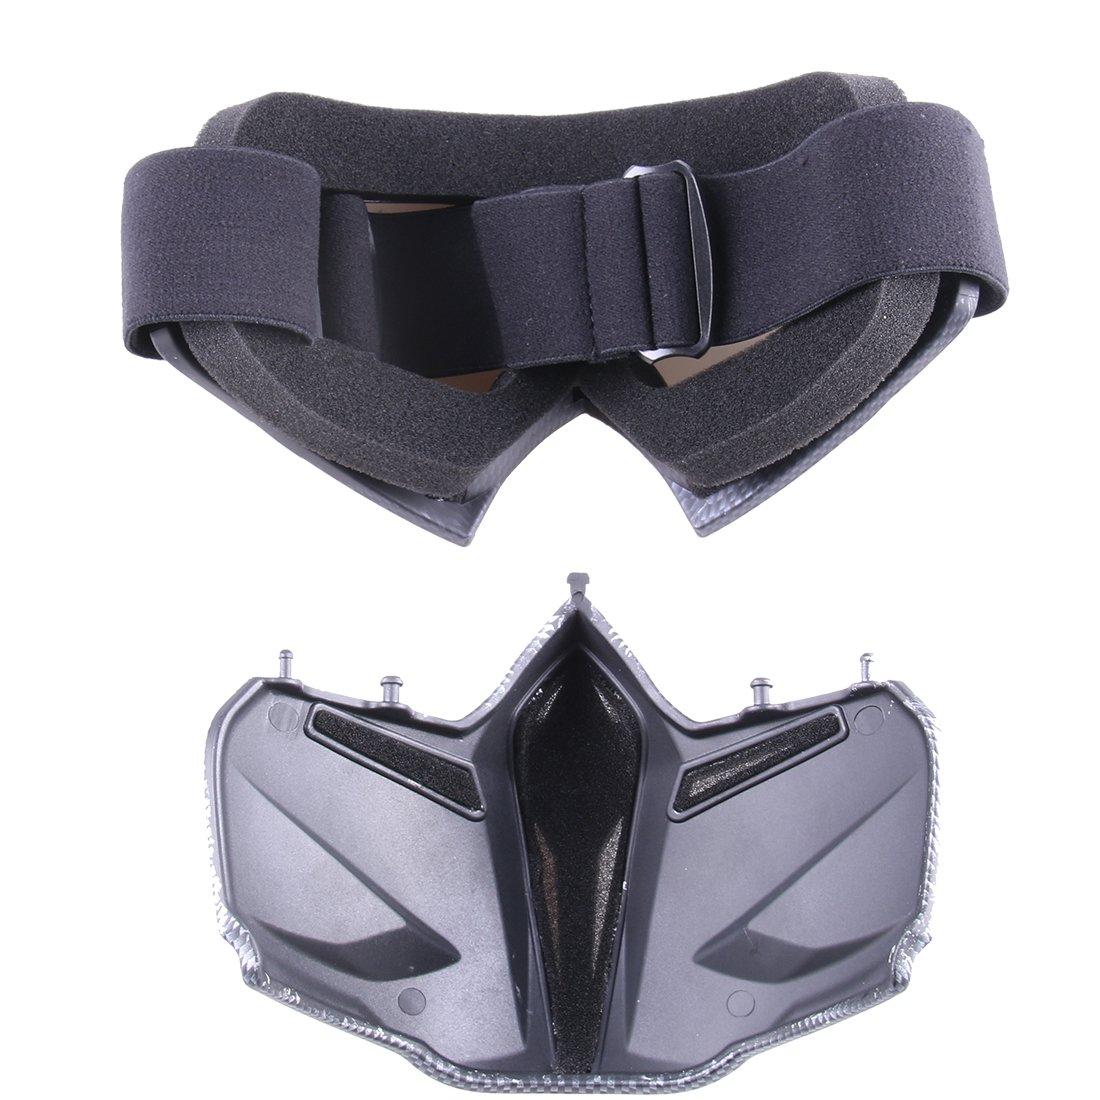 GANADA Masque de Protection Masque Tactique Masque Cool pour Nerf